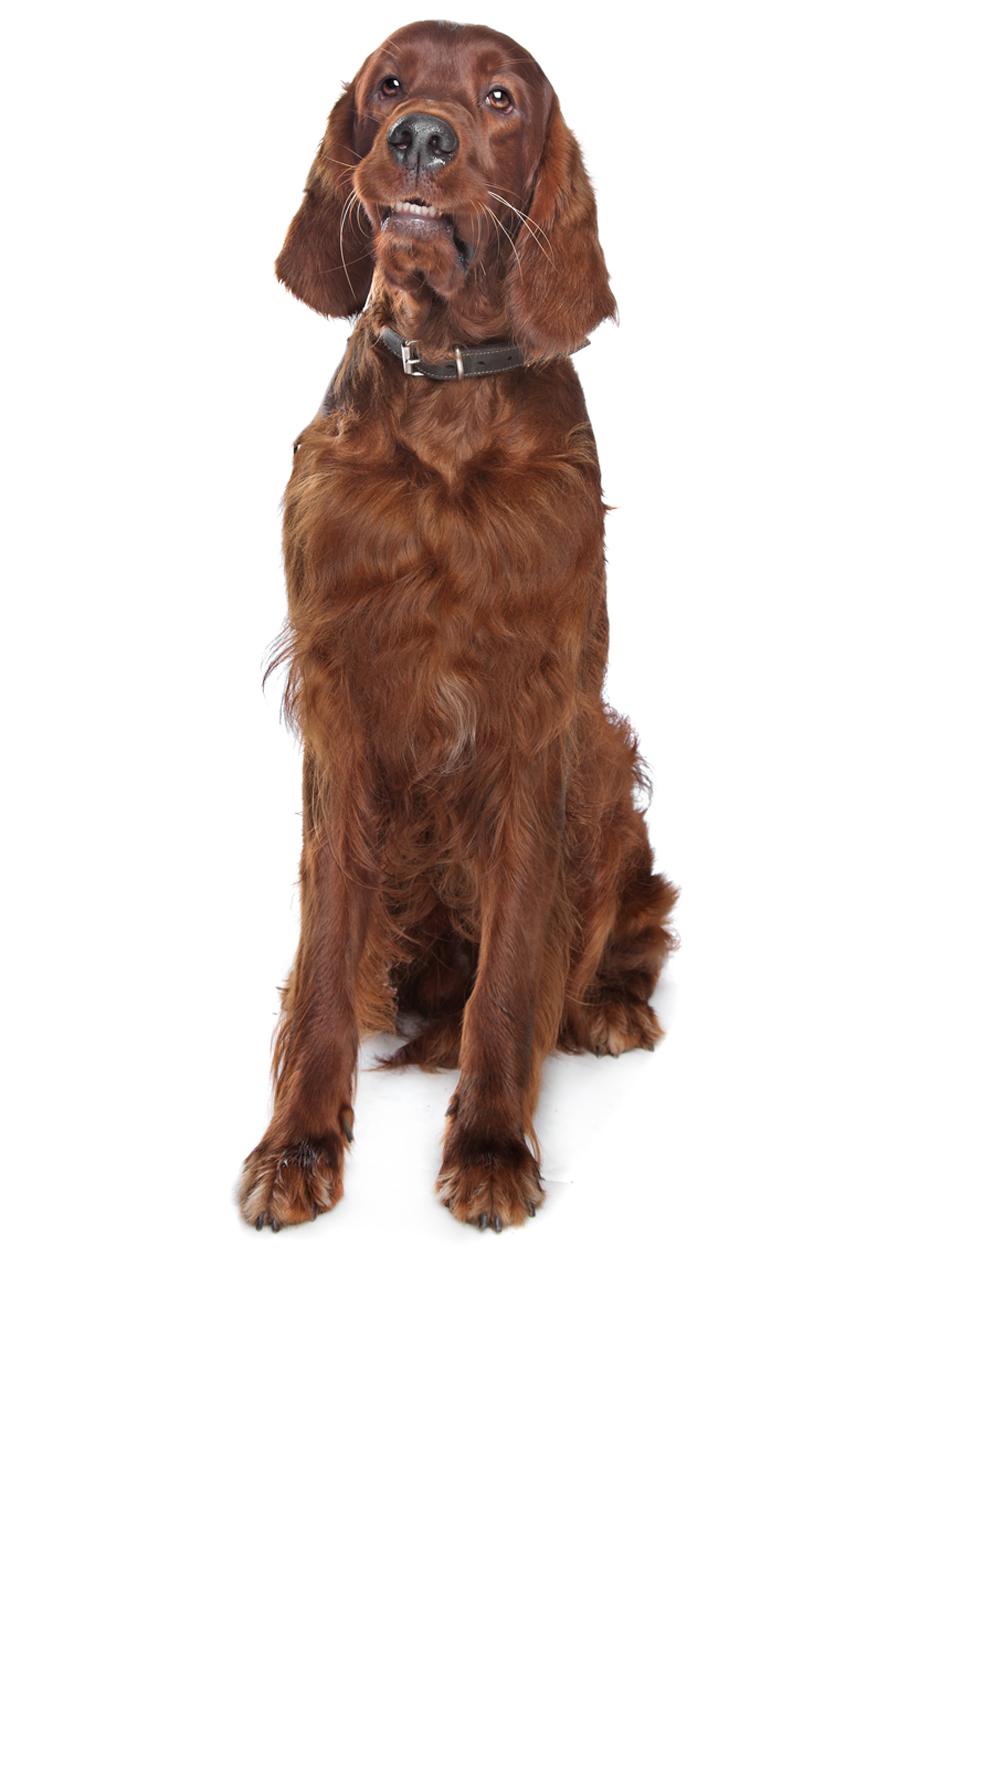 irish-setter dog breed